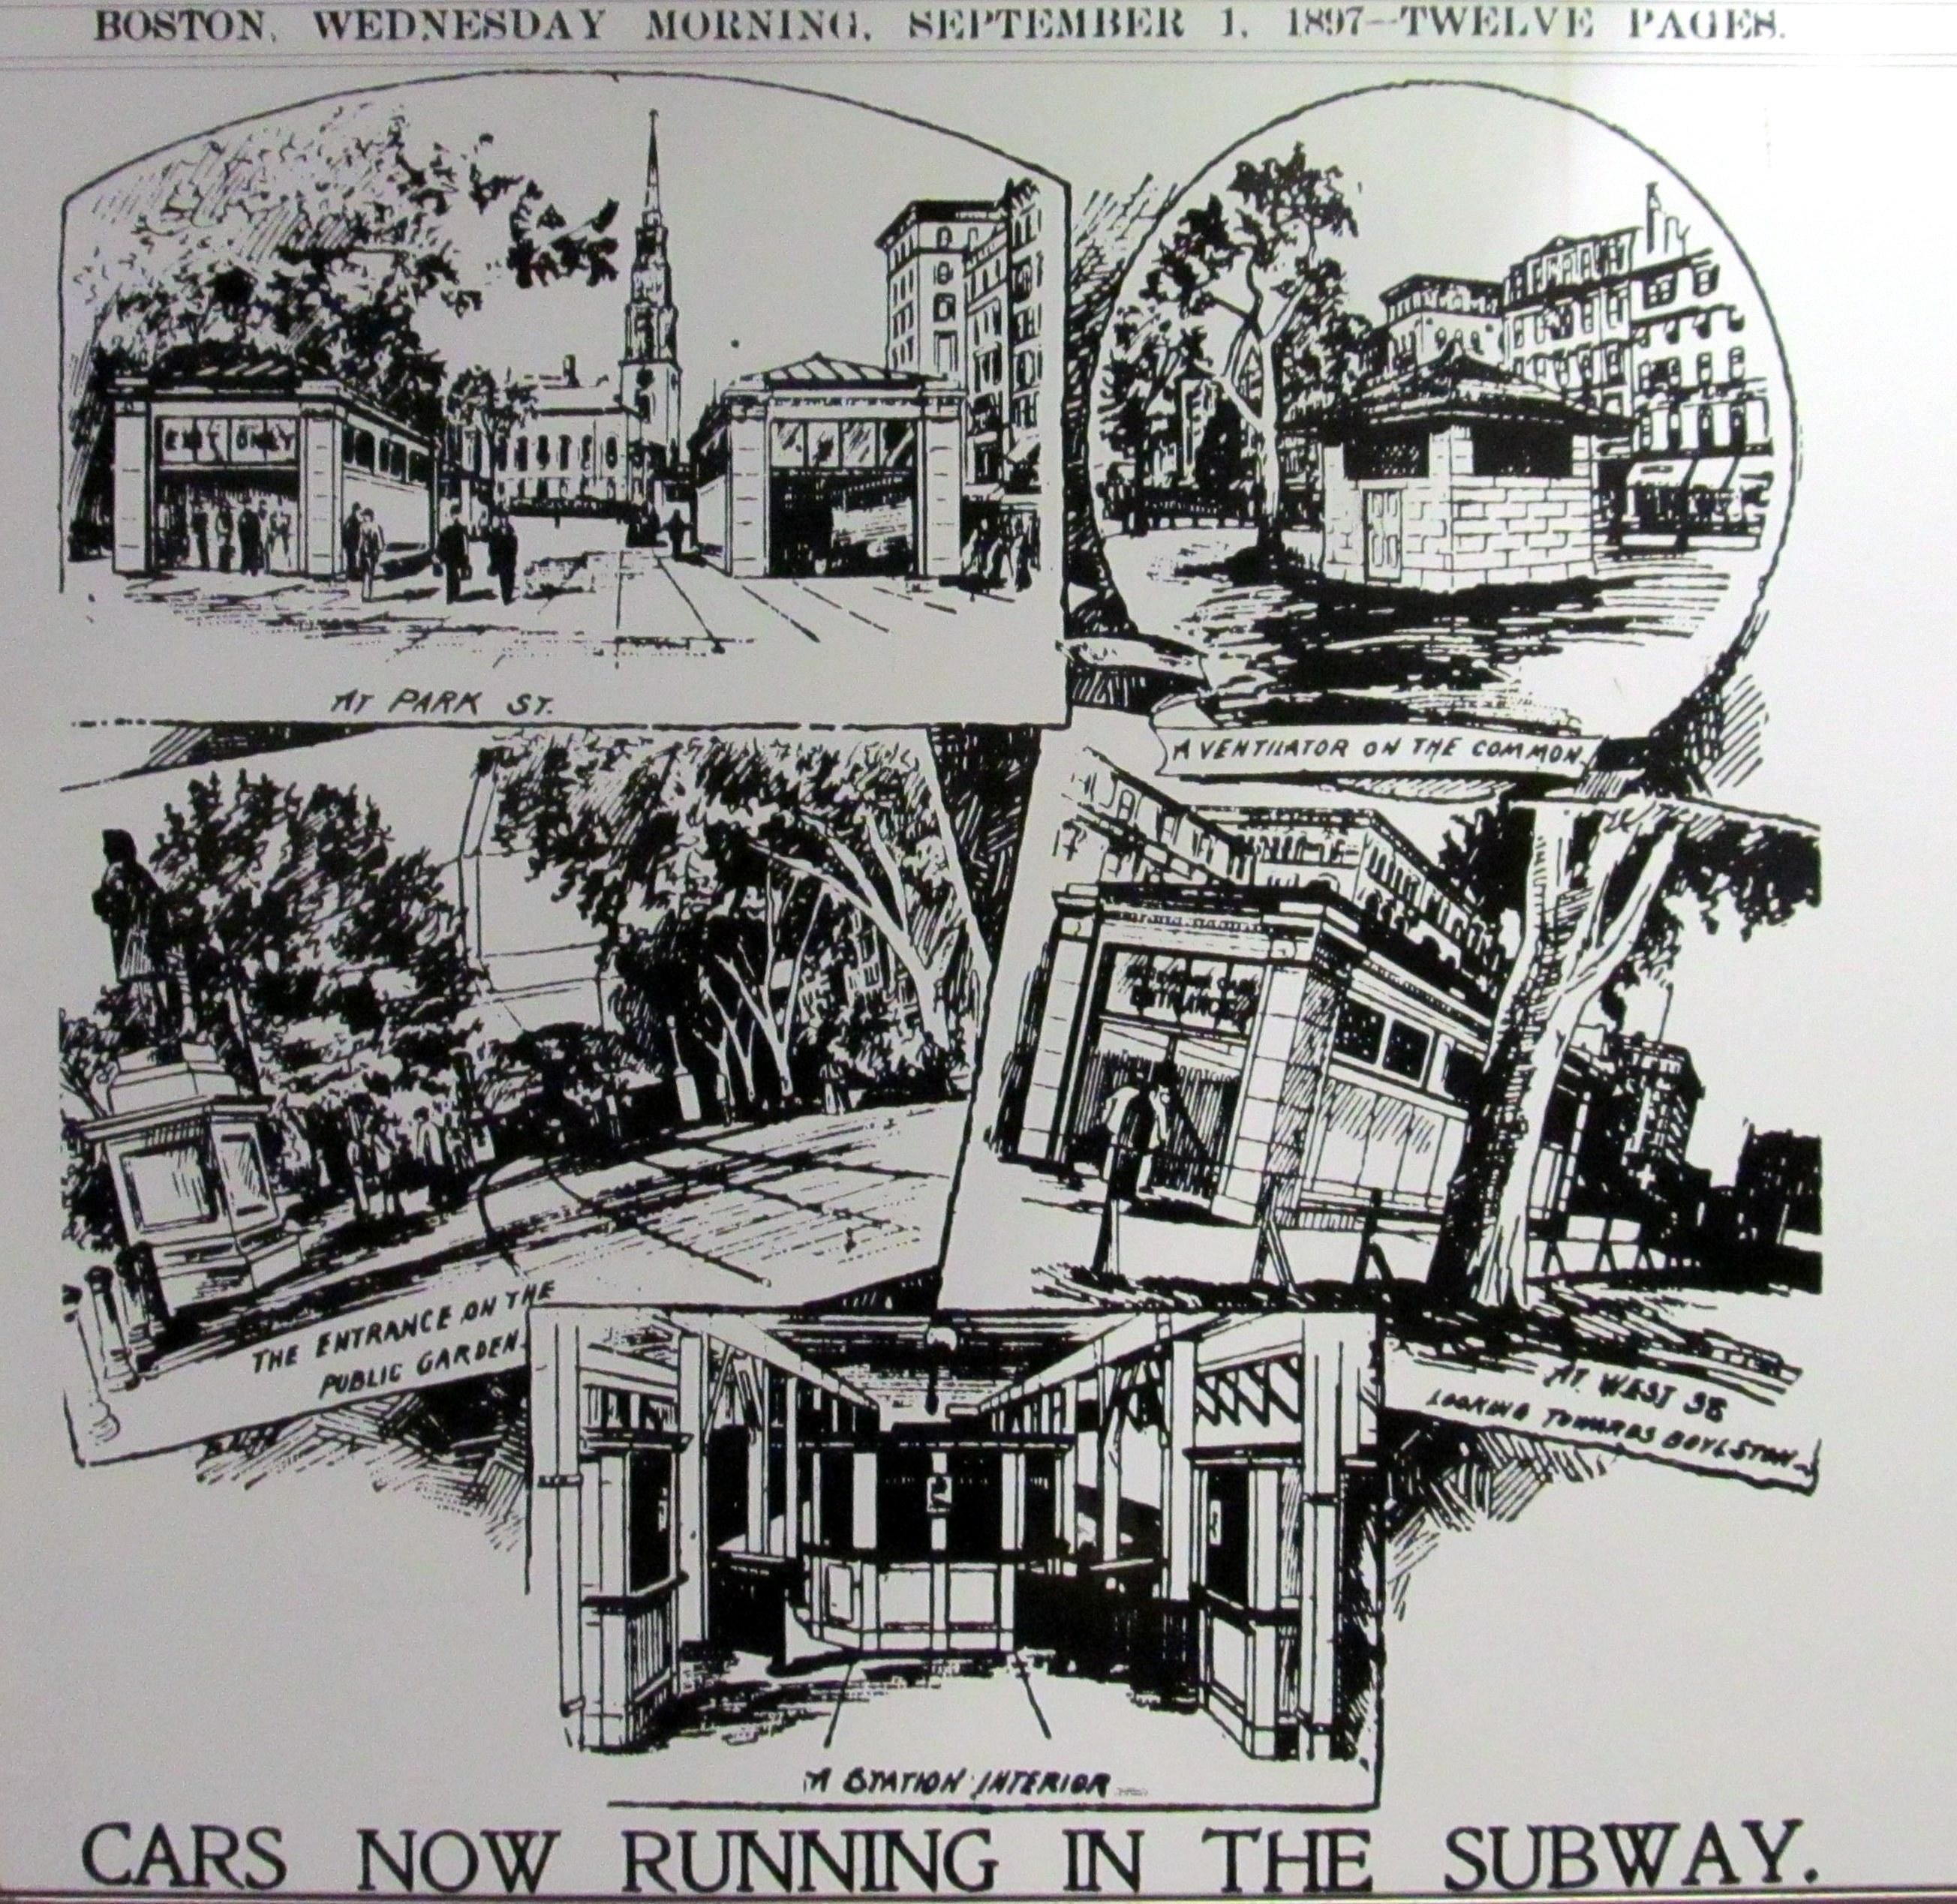 By Boston Daily Globe (Sign at Park Street station) [Public domain], via Wikimedia Commons